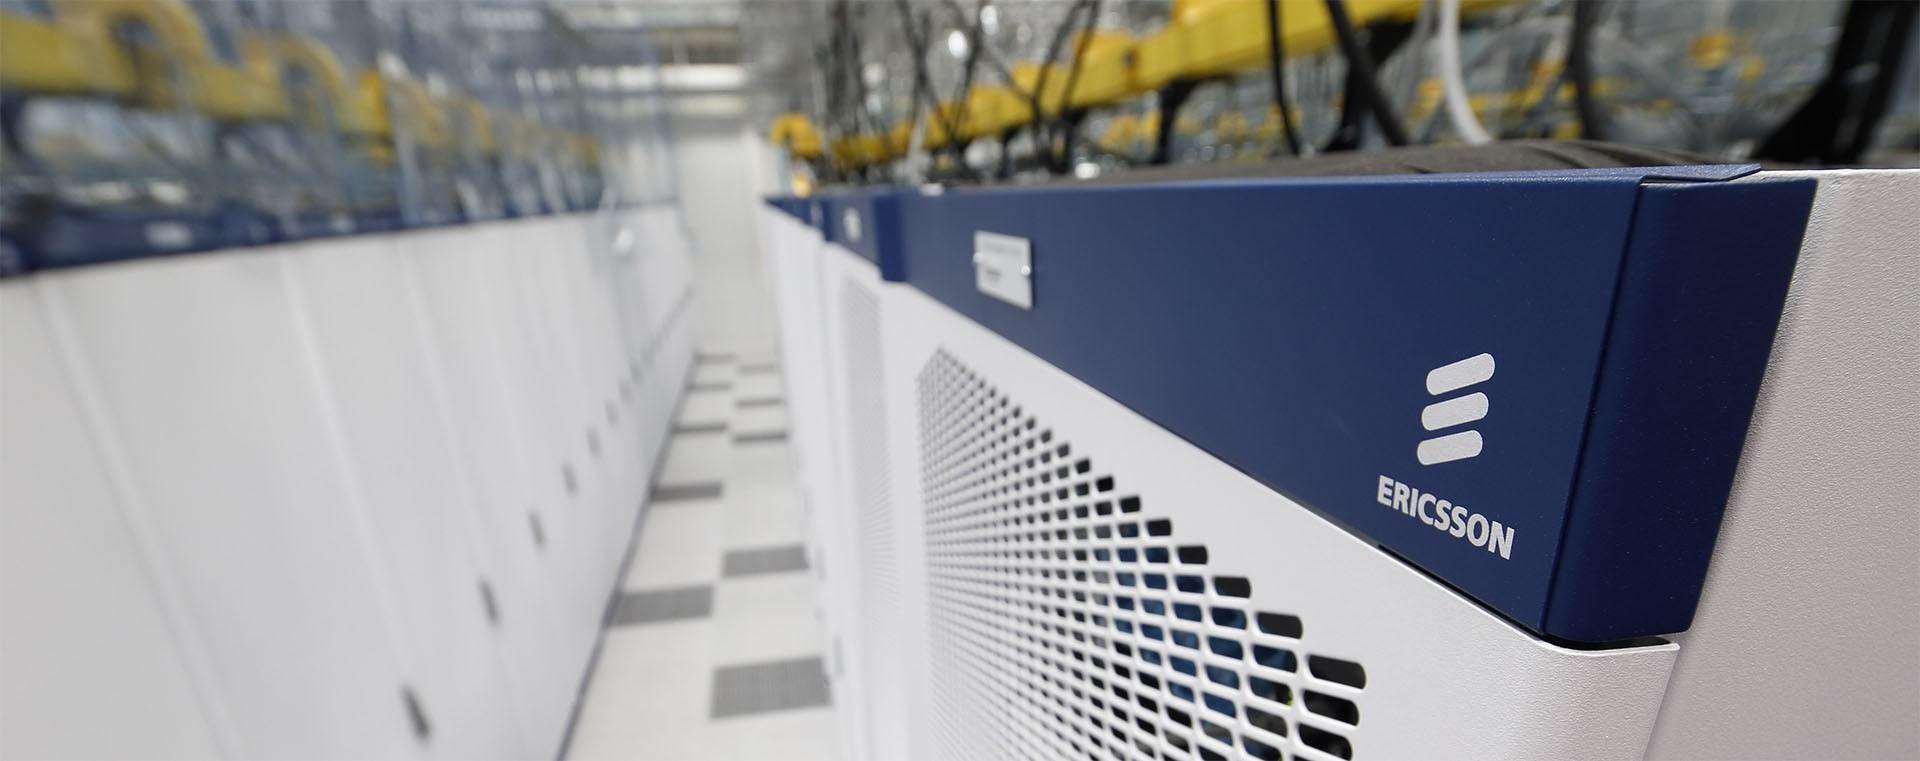 Ericsson prepares Canada's Eastlink for 5G, VoLTE - Halberd Bastion